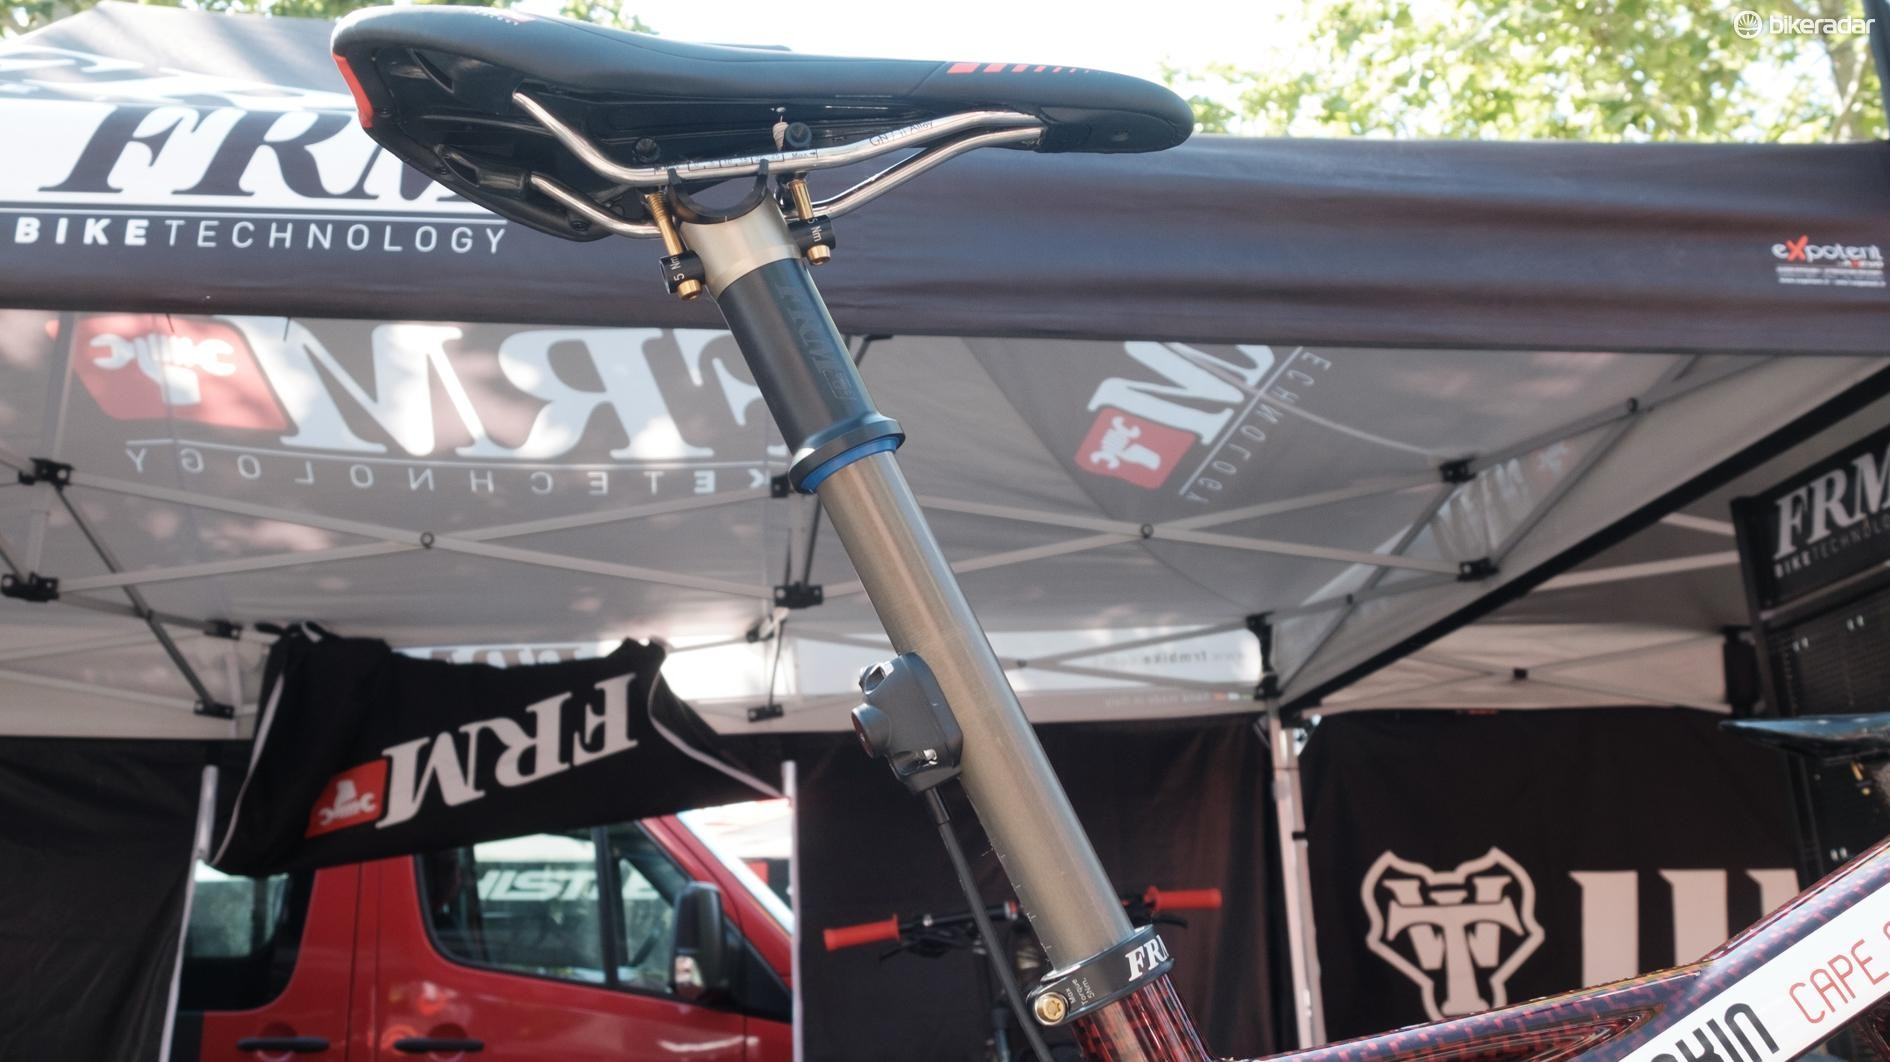 The bike was sporting the brand's OBI1 dropper seatpost